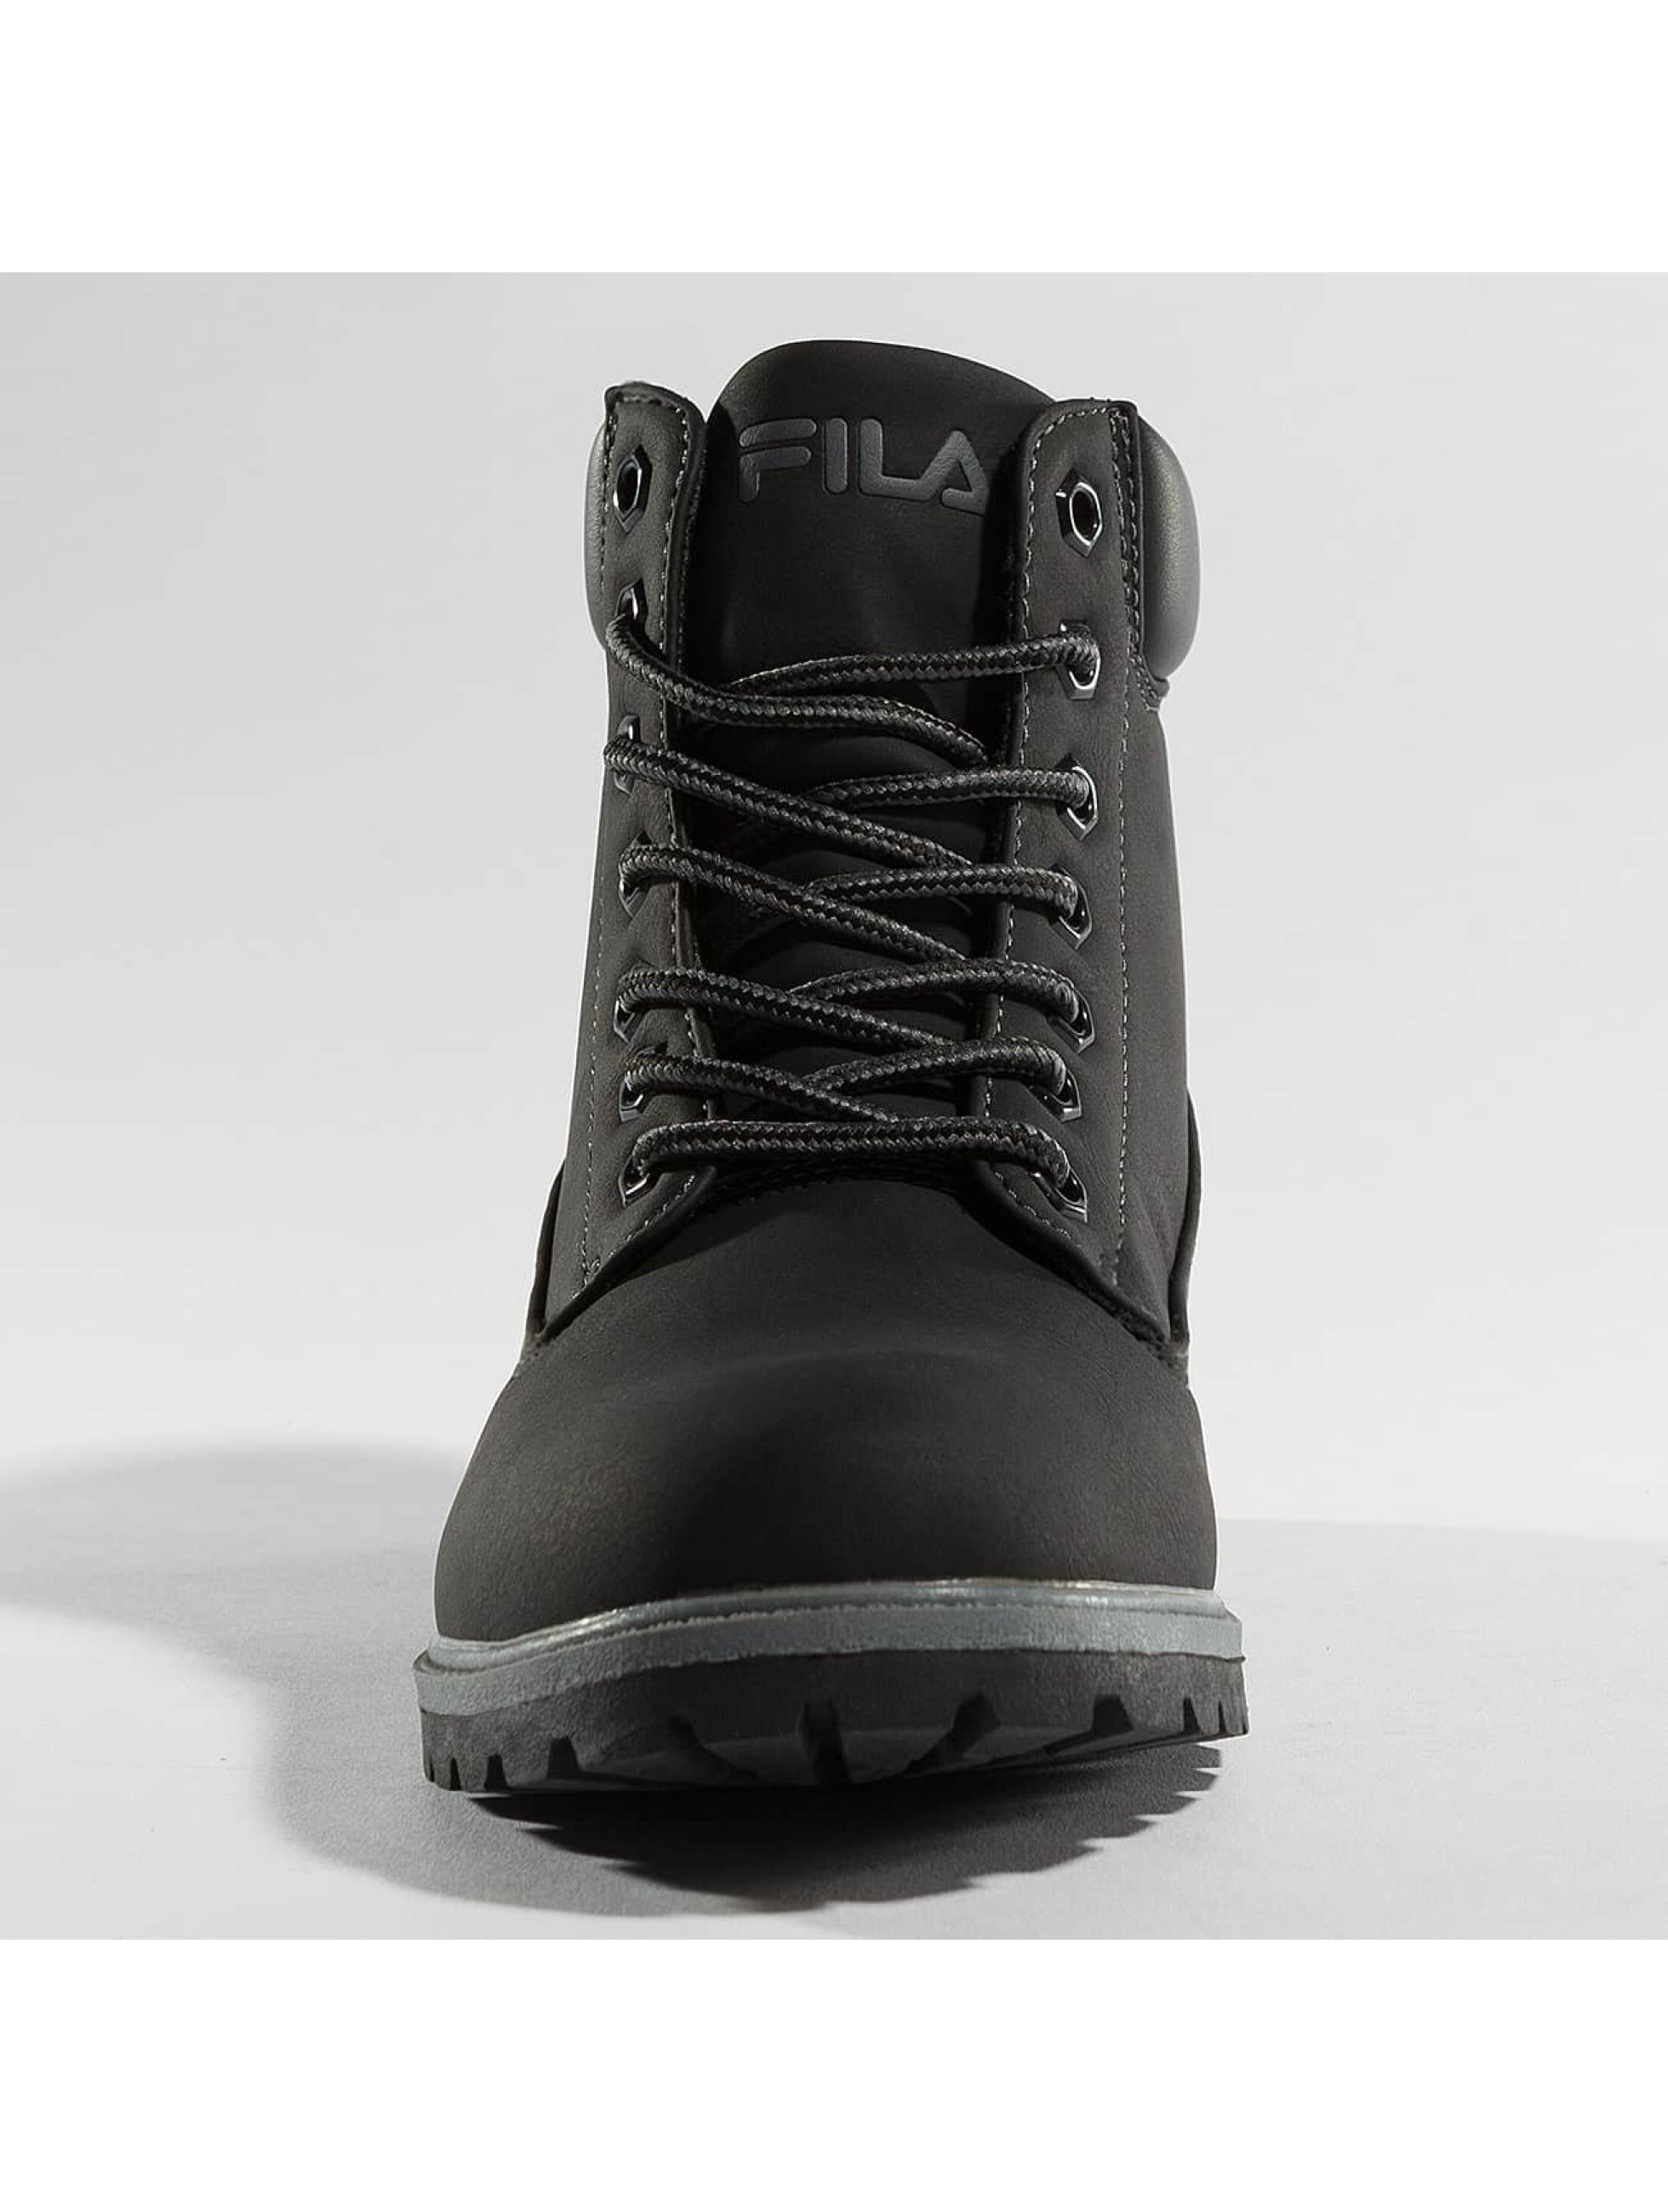 FILA Boots Base Maverick Mick black